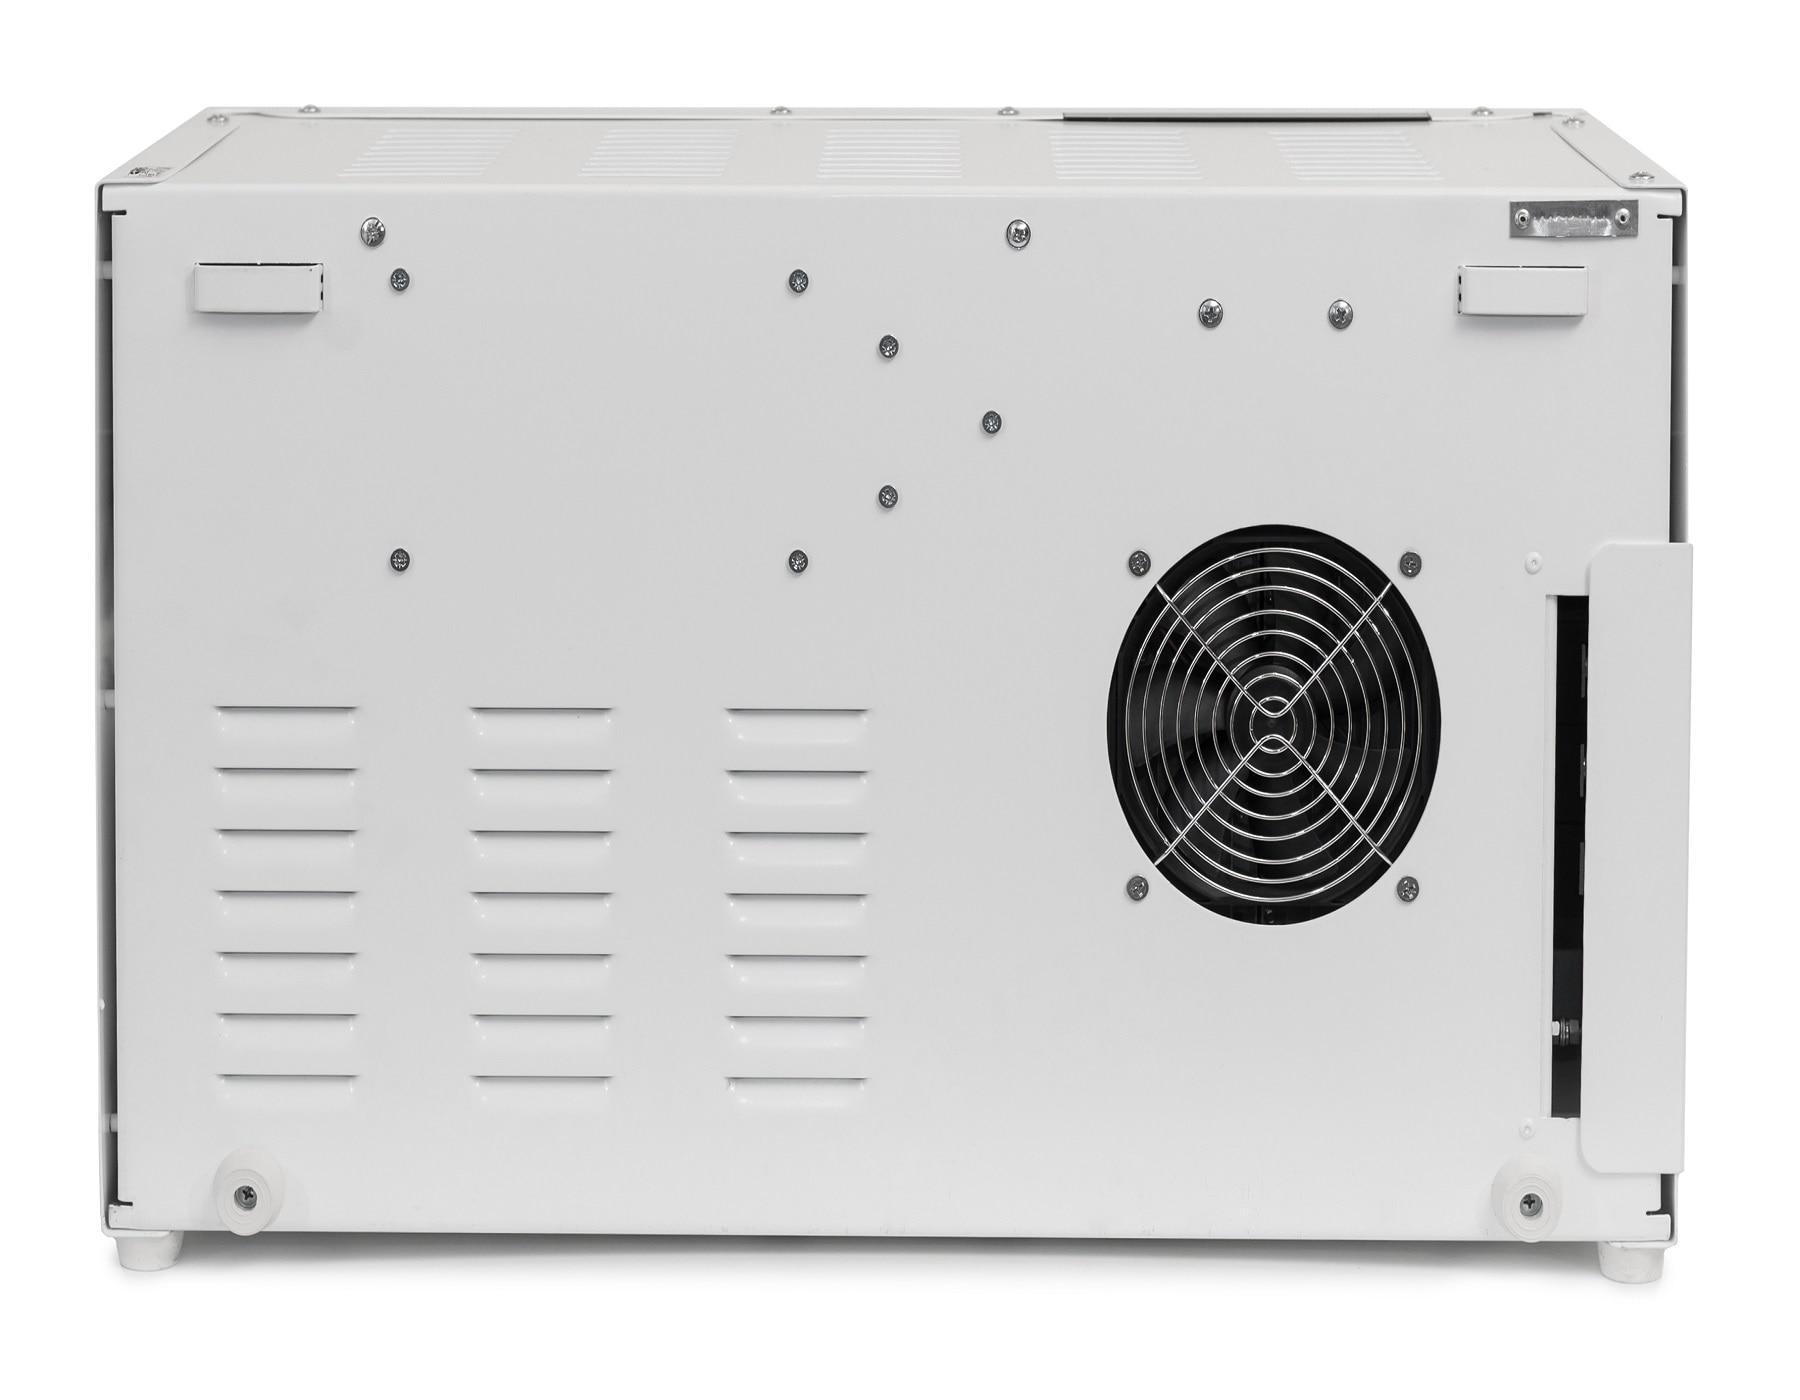 Стабилизаторы напряжения - Стабилизатор напряжения 12 кВт РRIME 000001456 - Фото 2